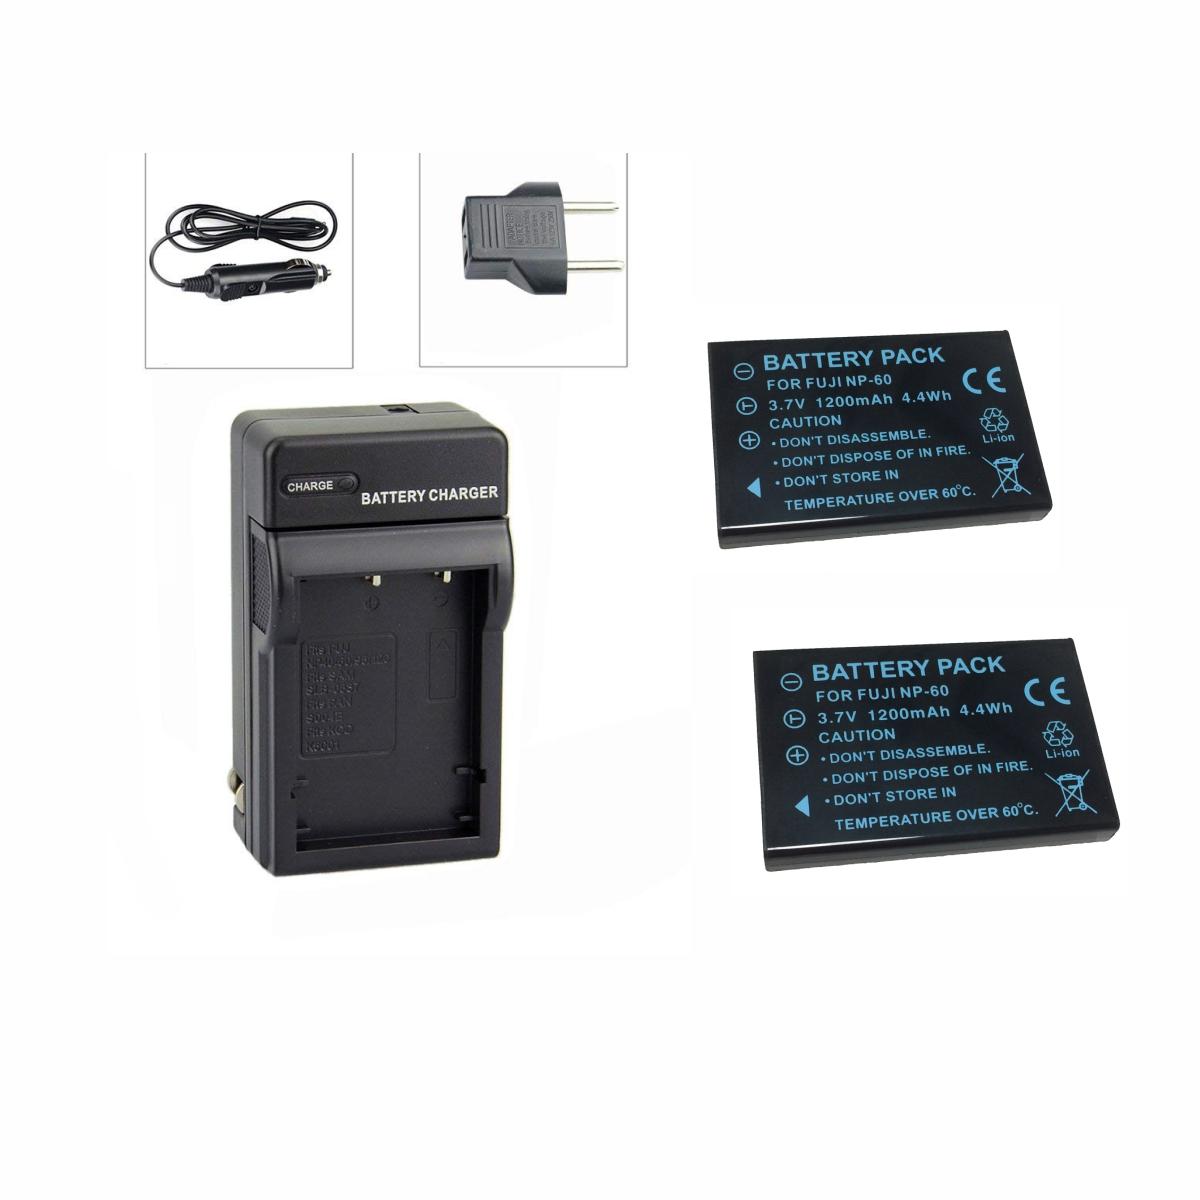 Kit 2 Baterias NP-60 + Carregador para Fuji FINEPIX 50I, 401, F401, F410, F601